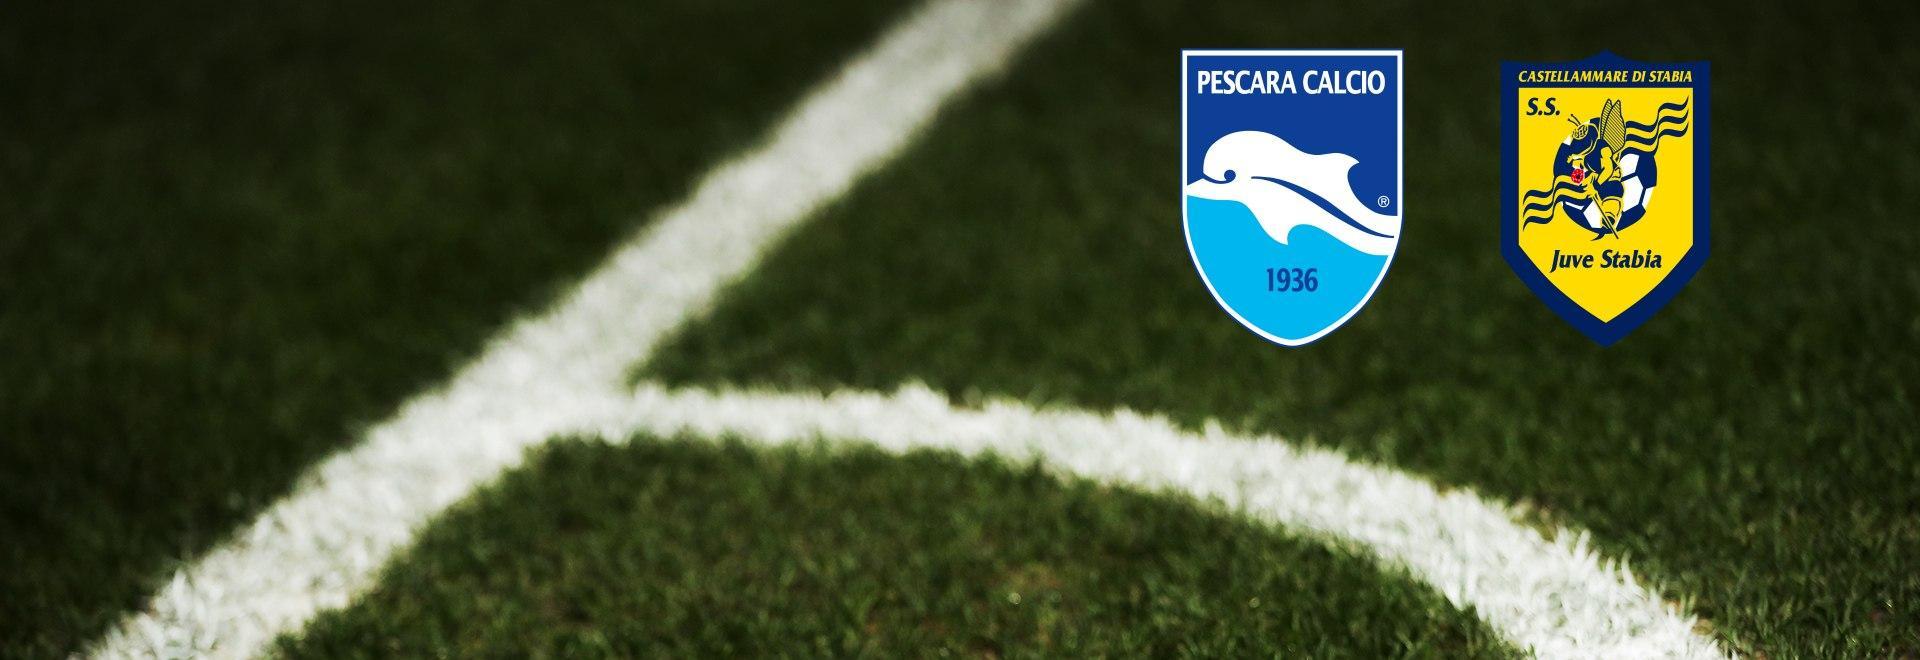 Pescara - Juve Stabia. 29a g.